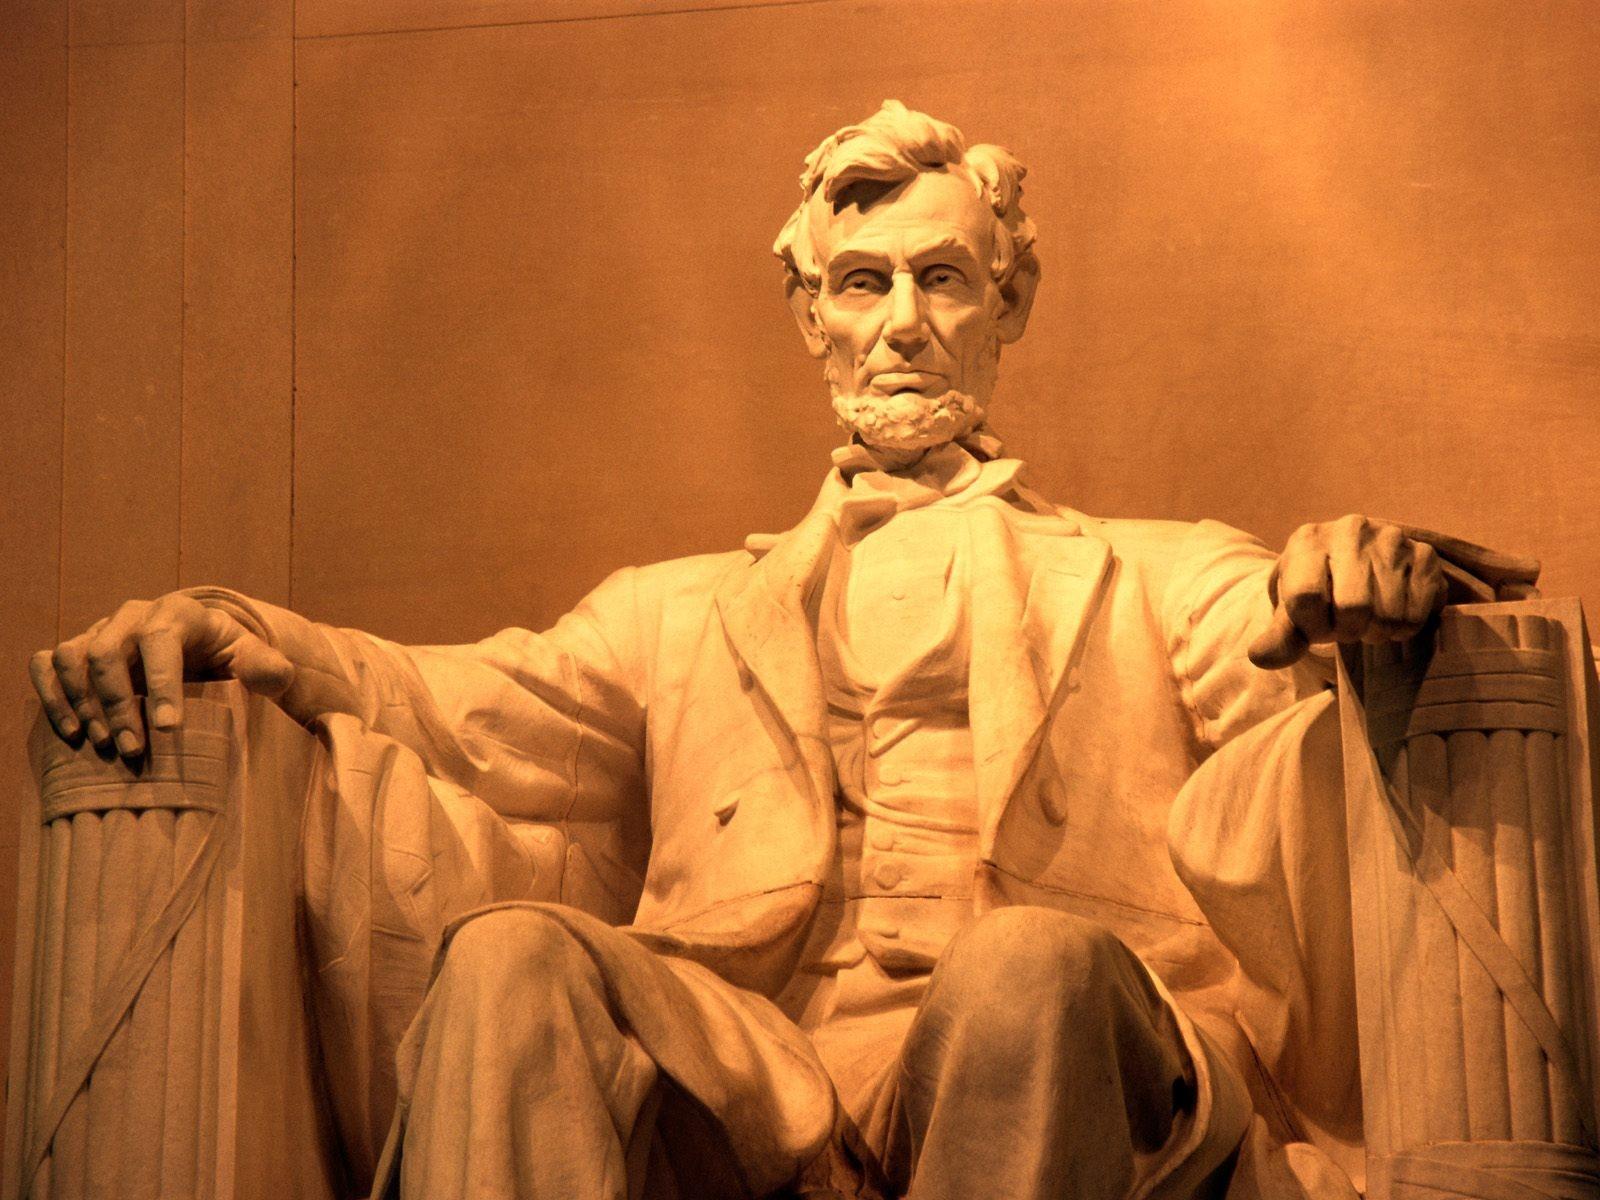 Abraham Lincoln Wallpaper 1600x1200 Abraham Lincoln USA Monument 1600x1200